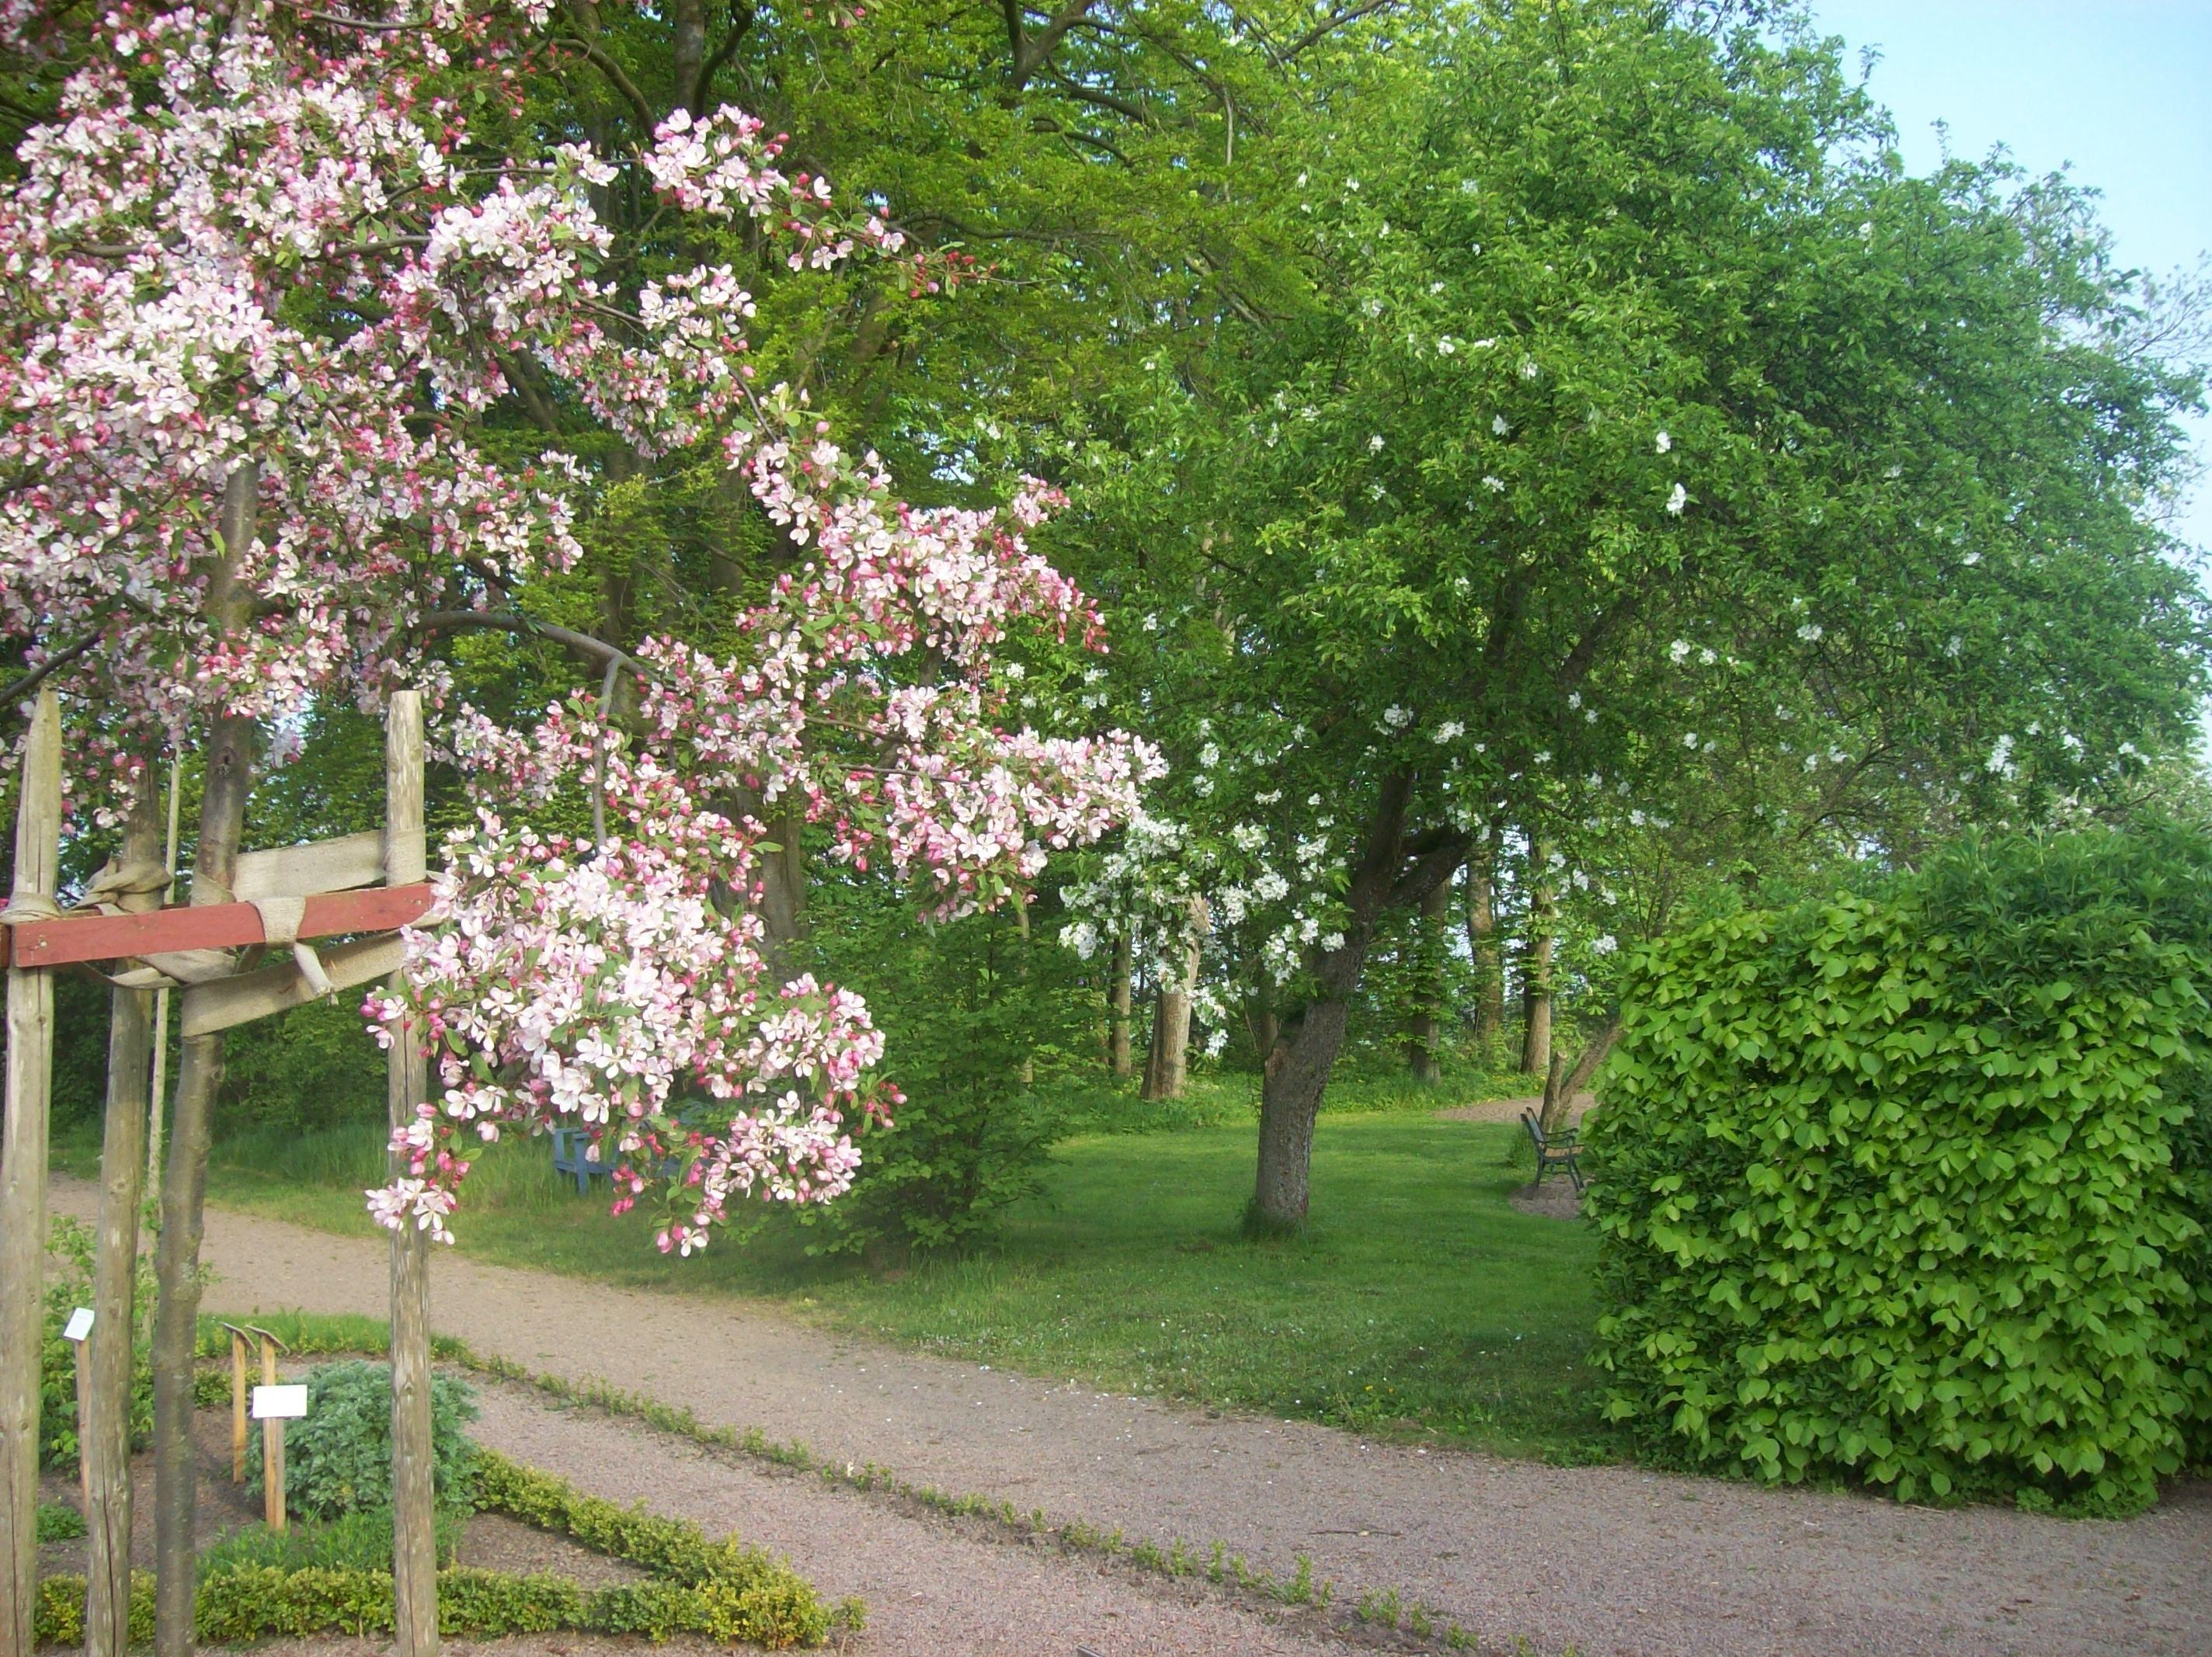 Bengt Åke Bengtsson, Heagården - ein alter Heimathof